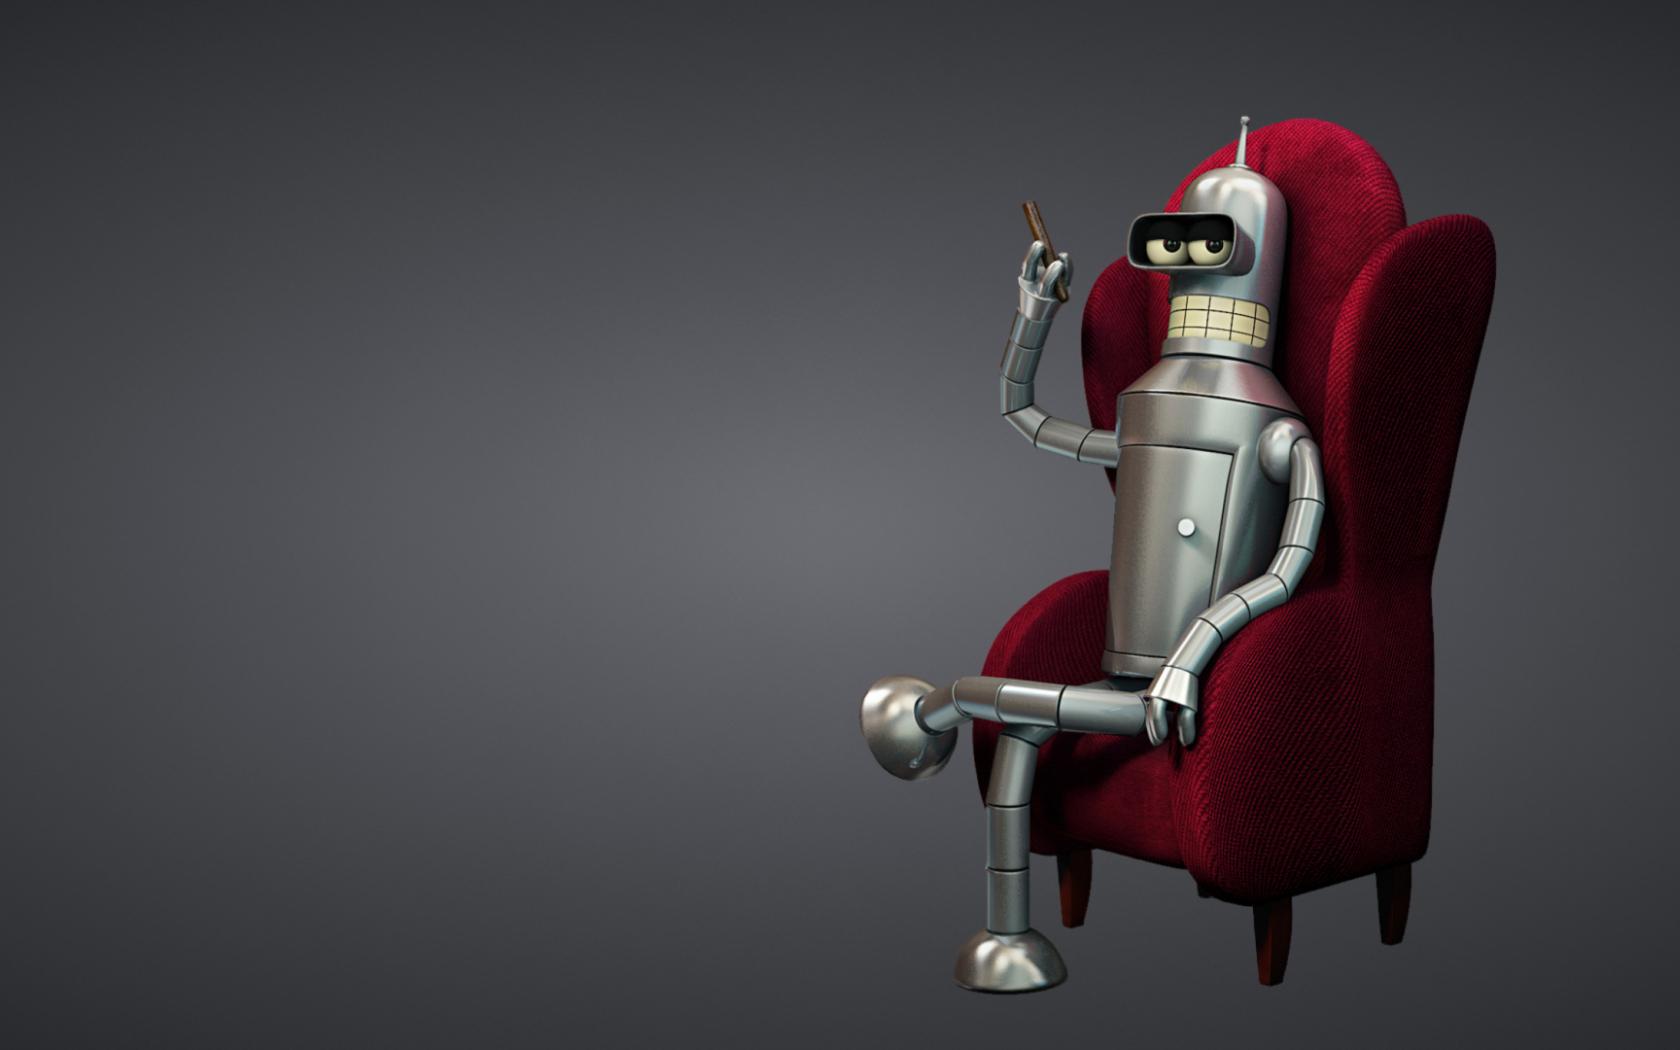 Free Download 3d Bender Futurama Sfondi Gratuiti Per Desktop